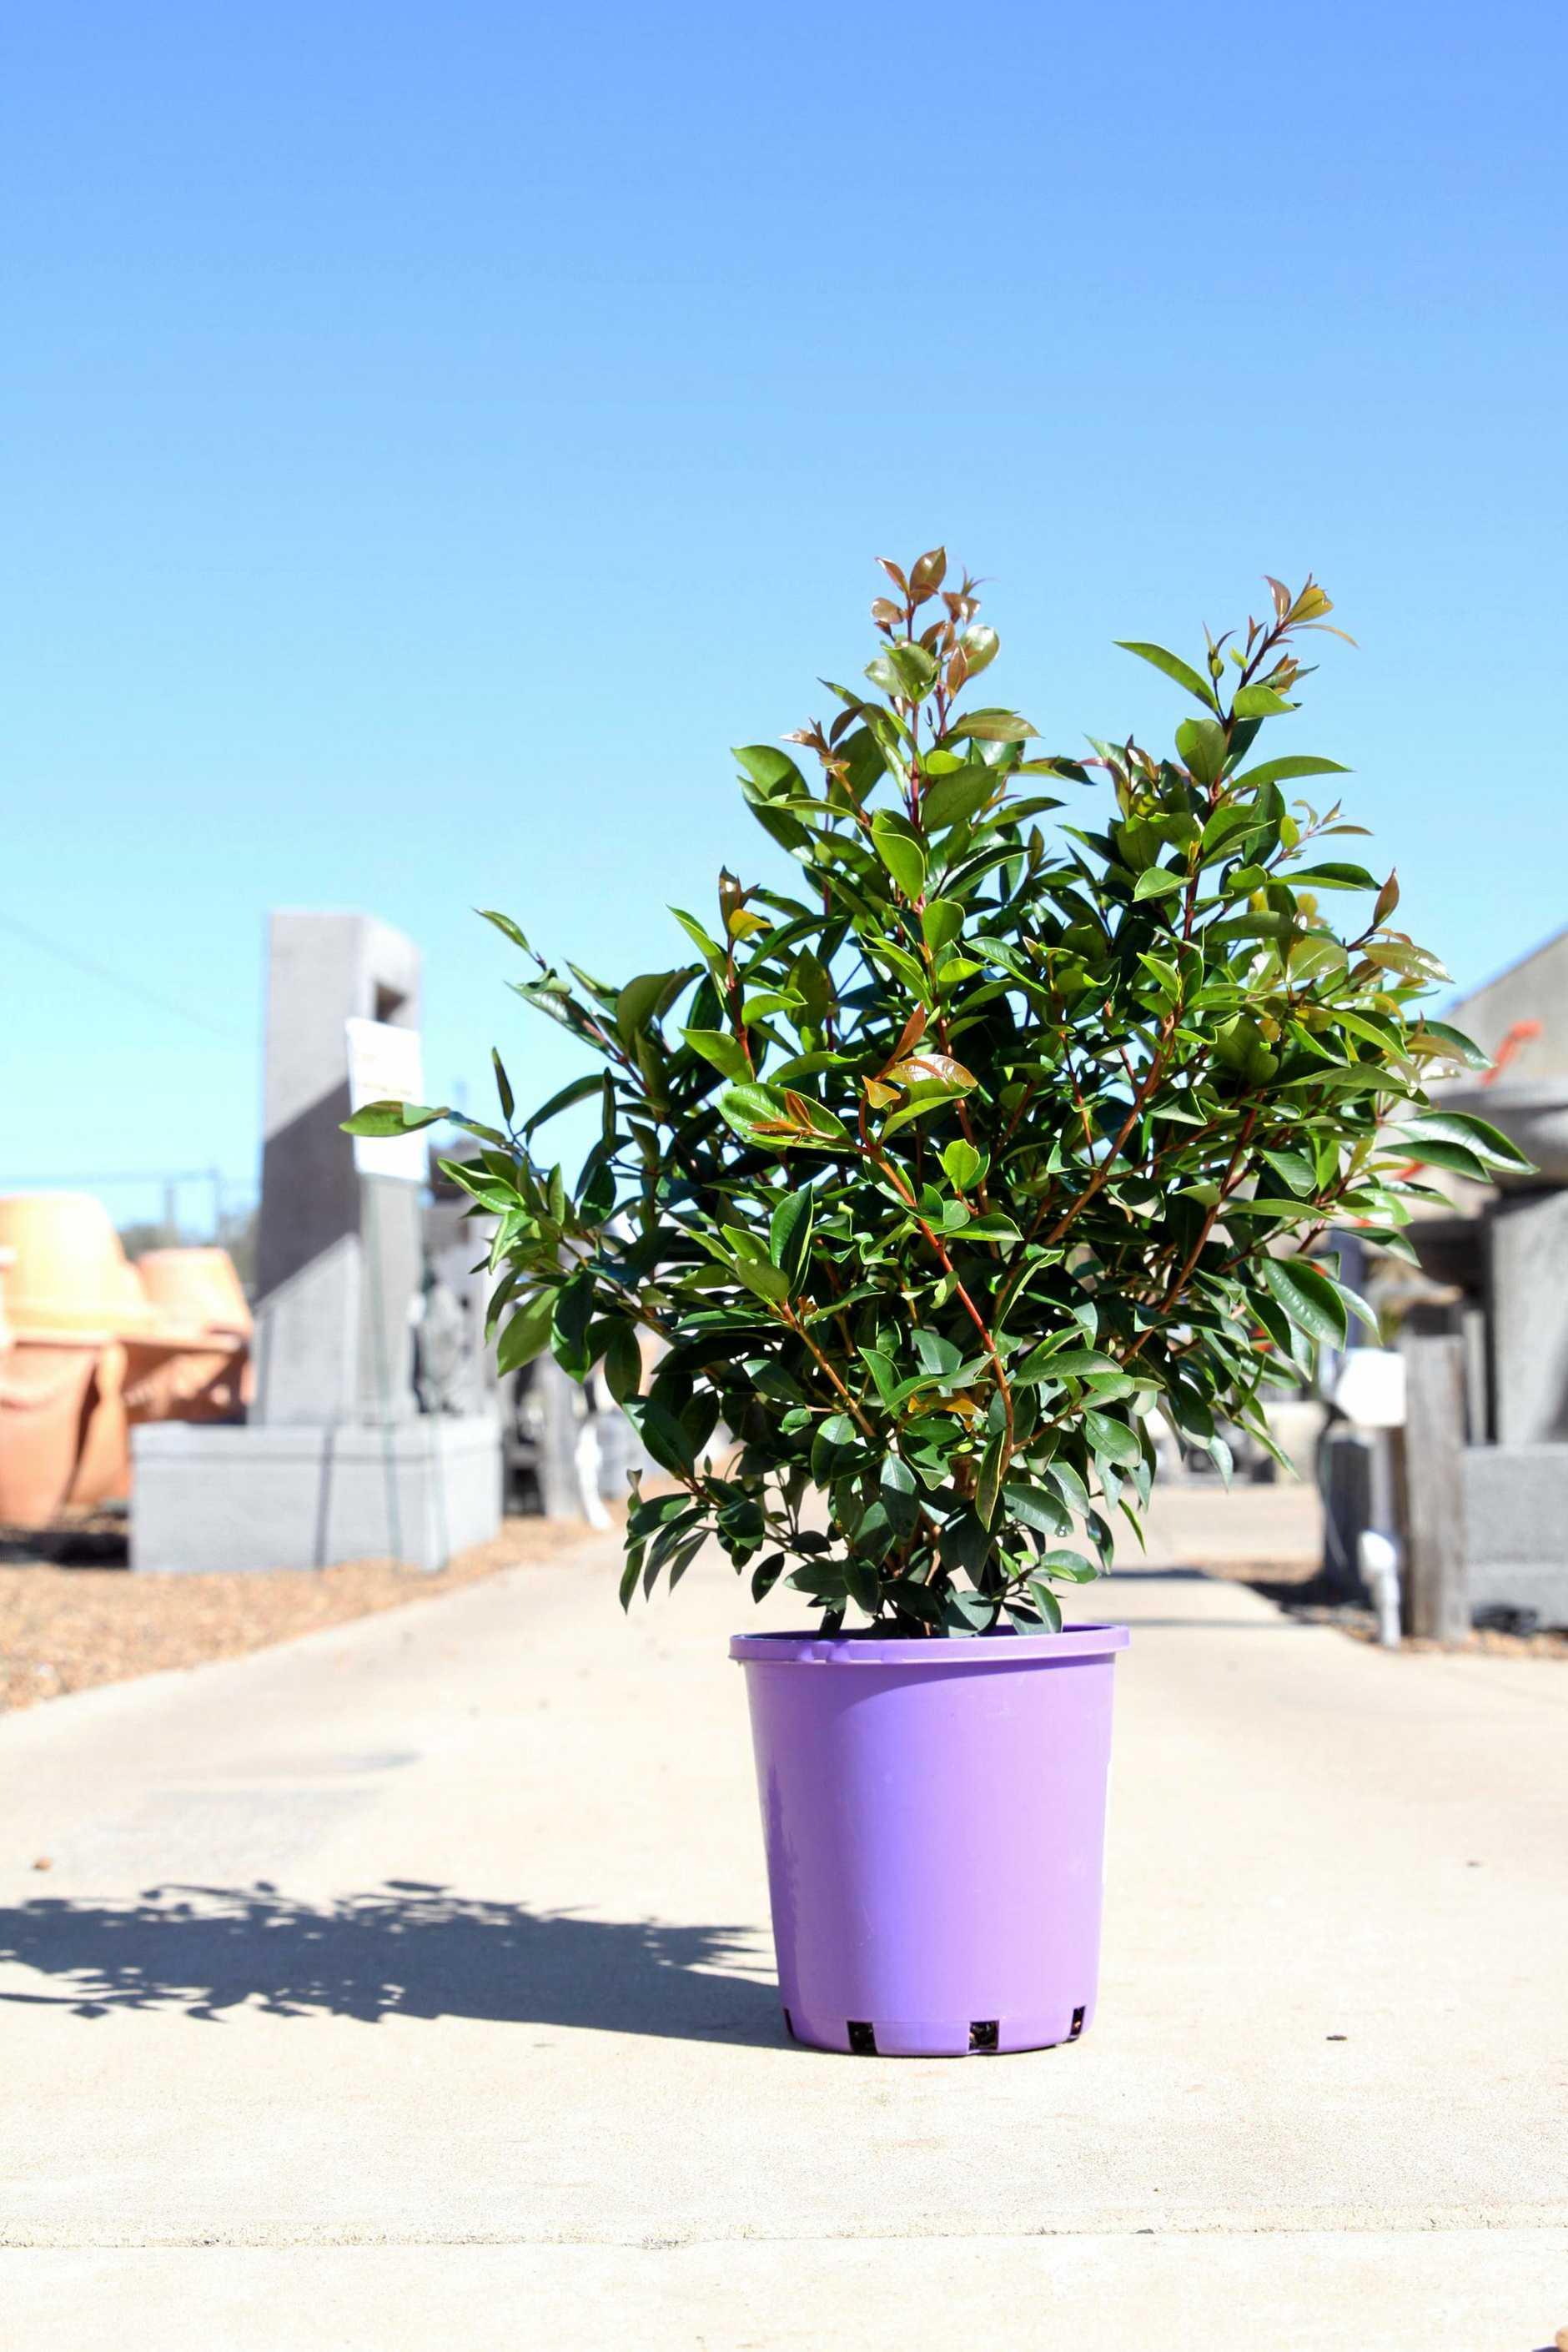 STOLEN: Lilly pillies have been stolen from Bundaberg's Landcare Nursery.